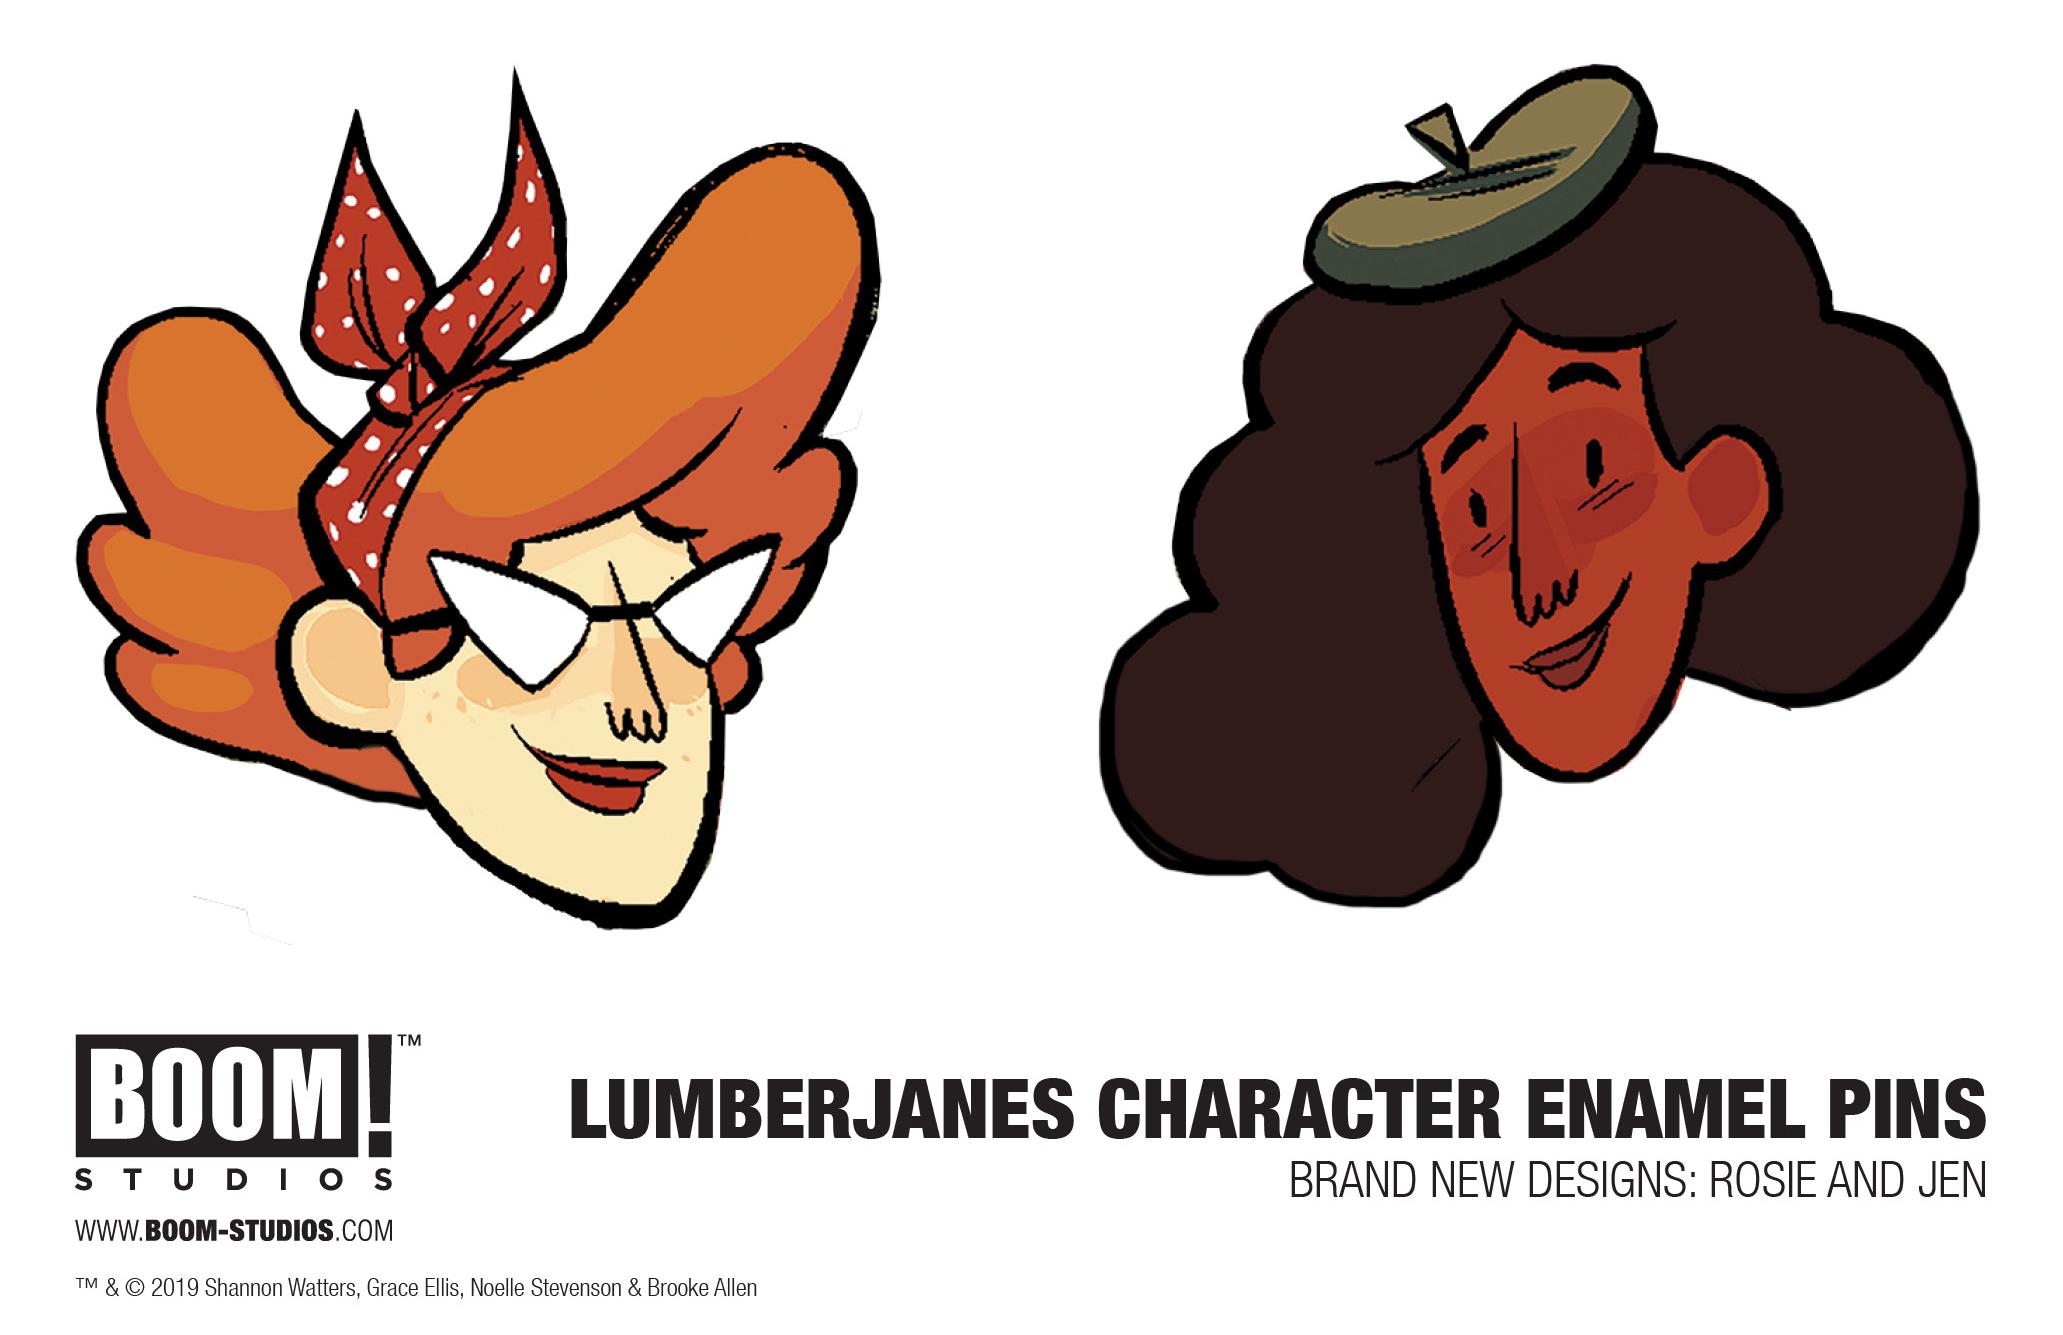 SDCC_Lumberjanes_Pins_Promo.jpg